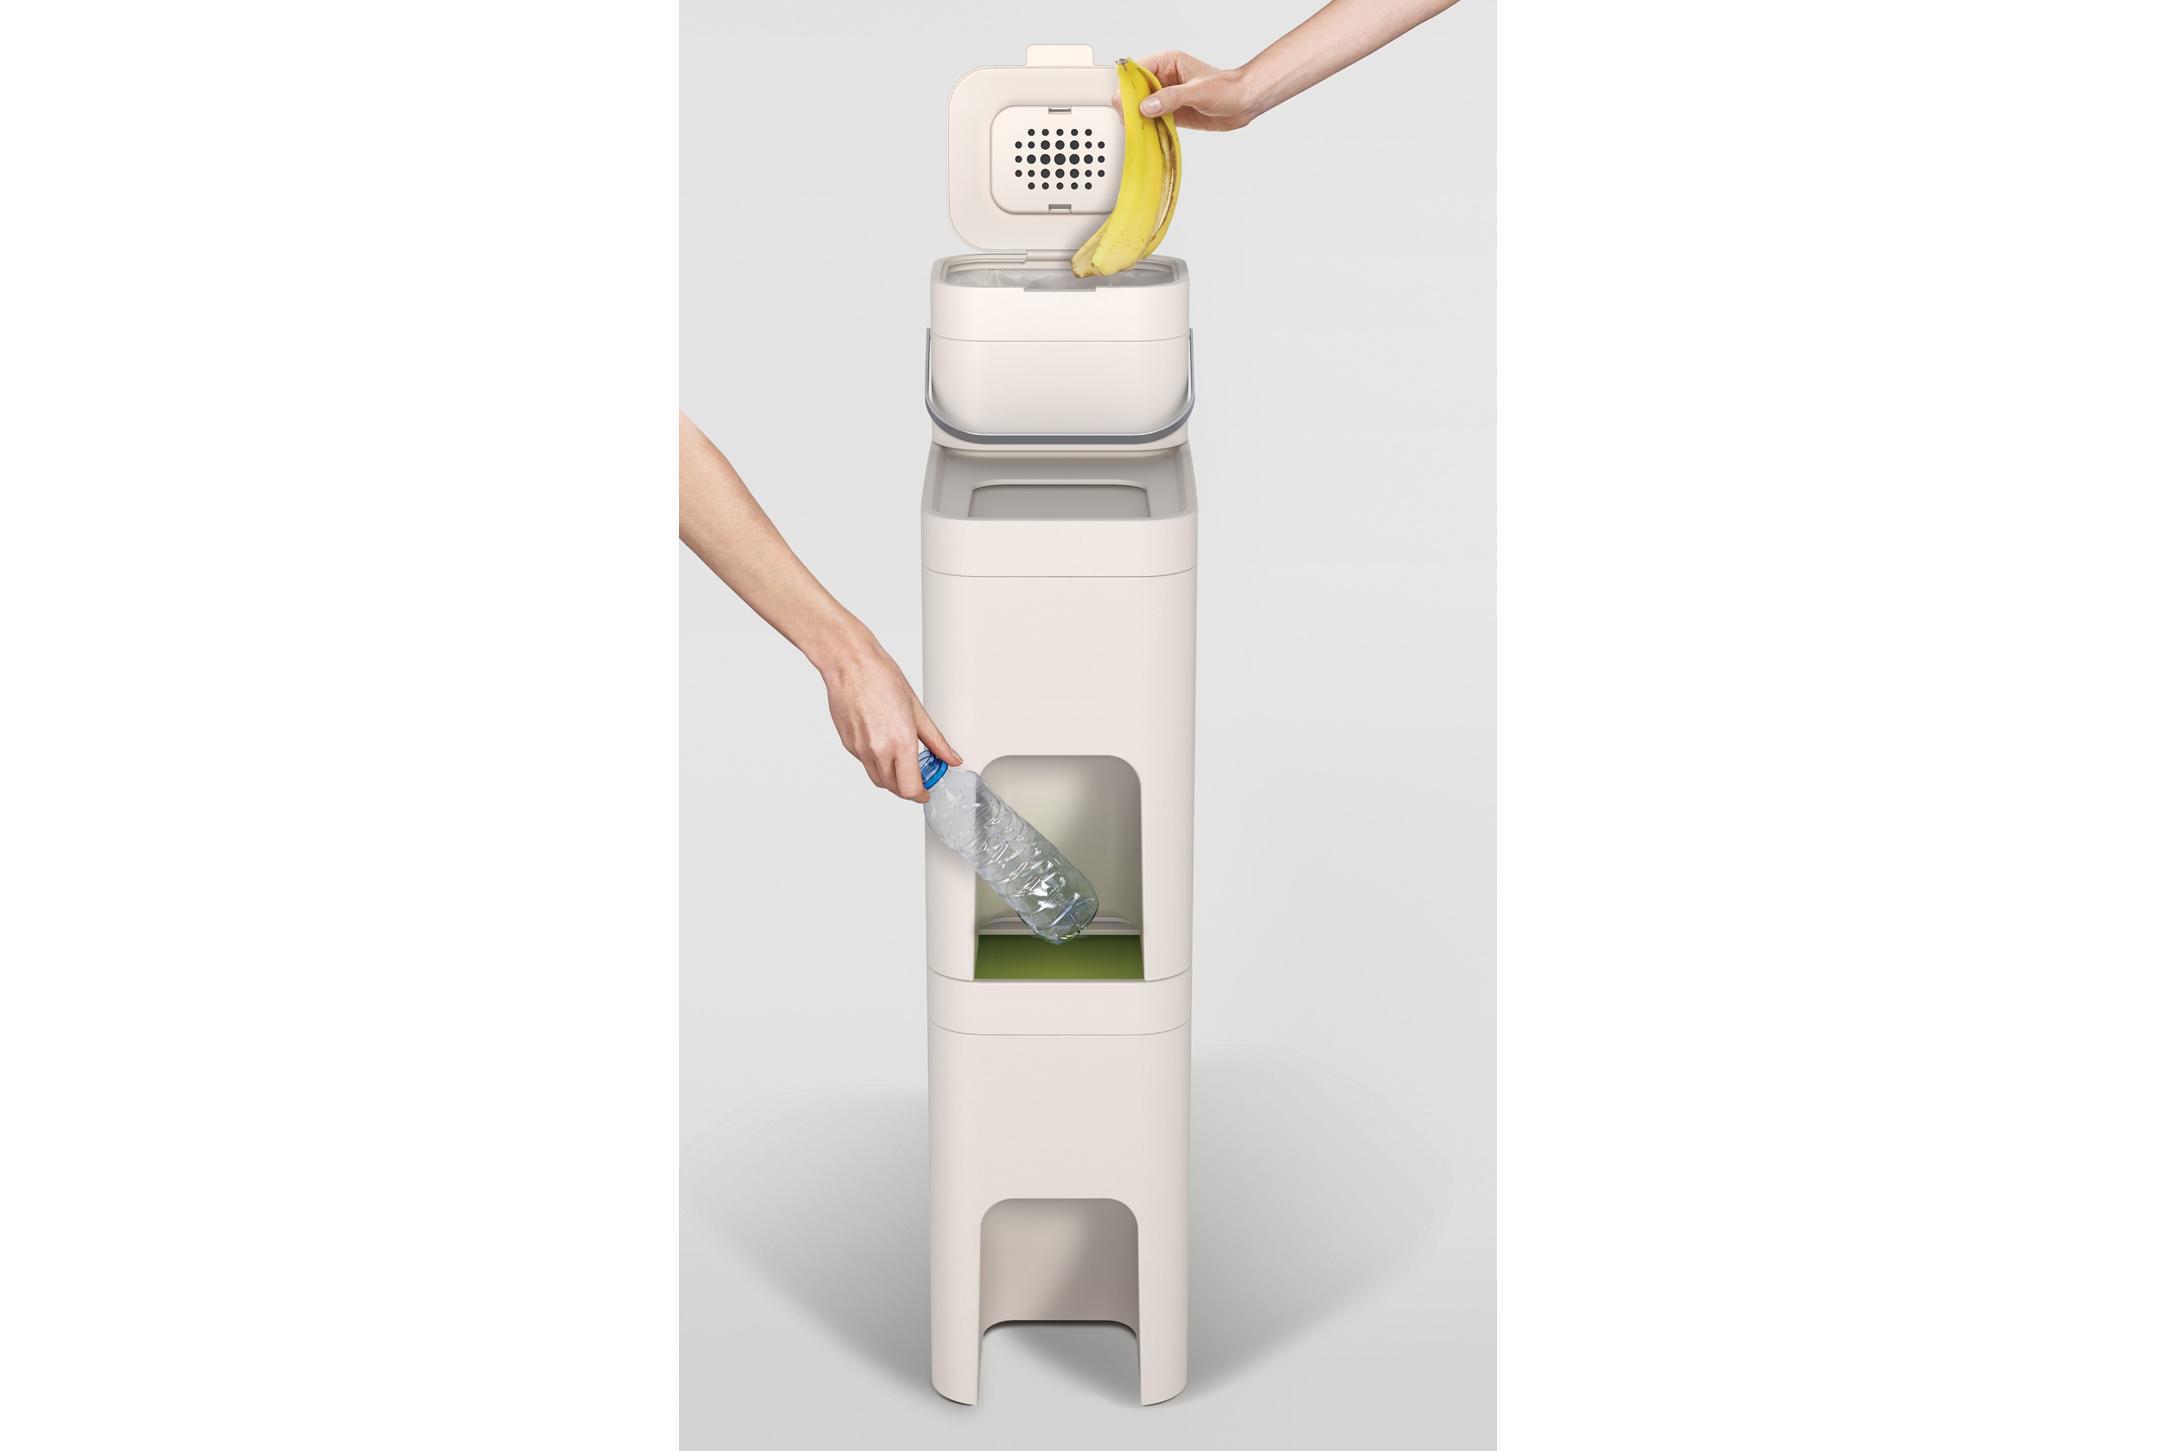 pearsonlloyd-stack-and-totem-joseph-joseph-designboom-007.jpg